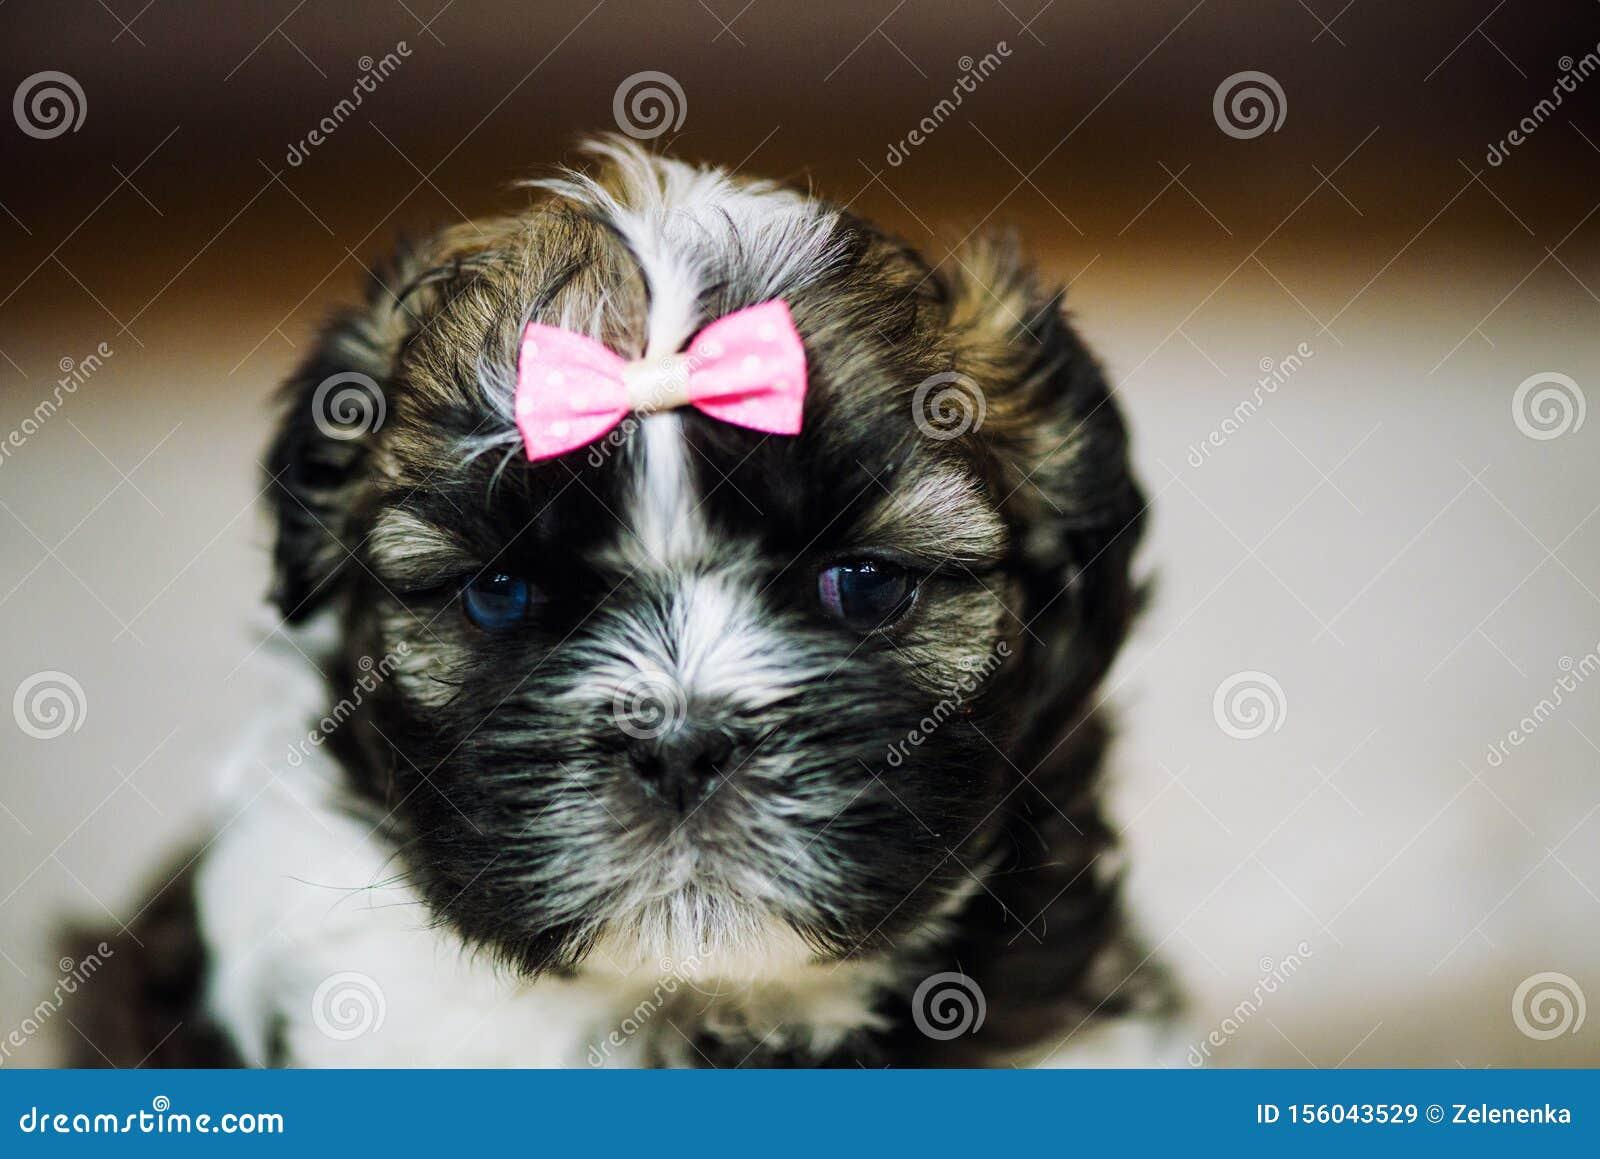 Shih Tzu Puppies Stock Image Image Of Animal Chair 156043529